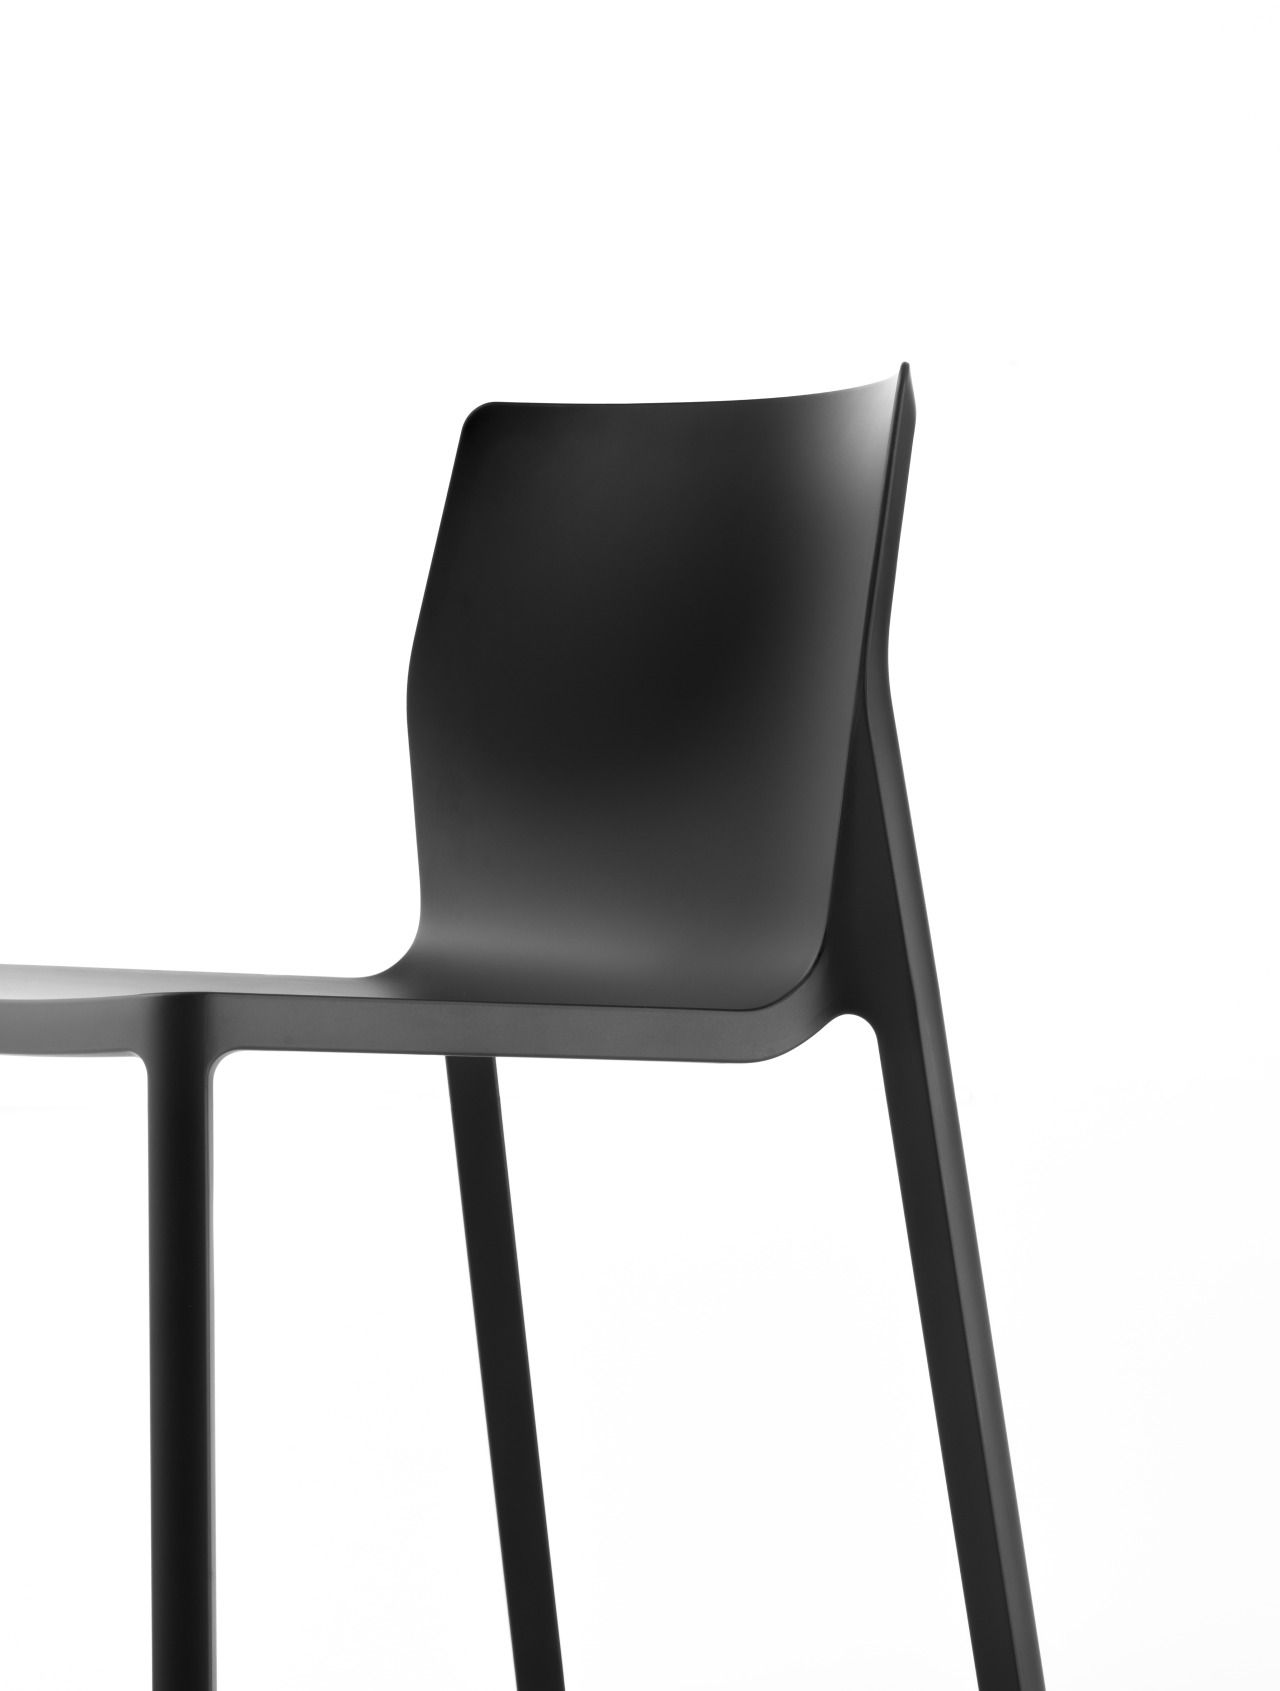 Stuhl design Möbeldesign Produktdesign Stühle Minimalistisch Follow Me Dining Room